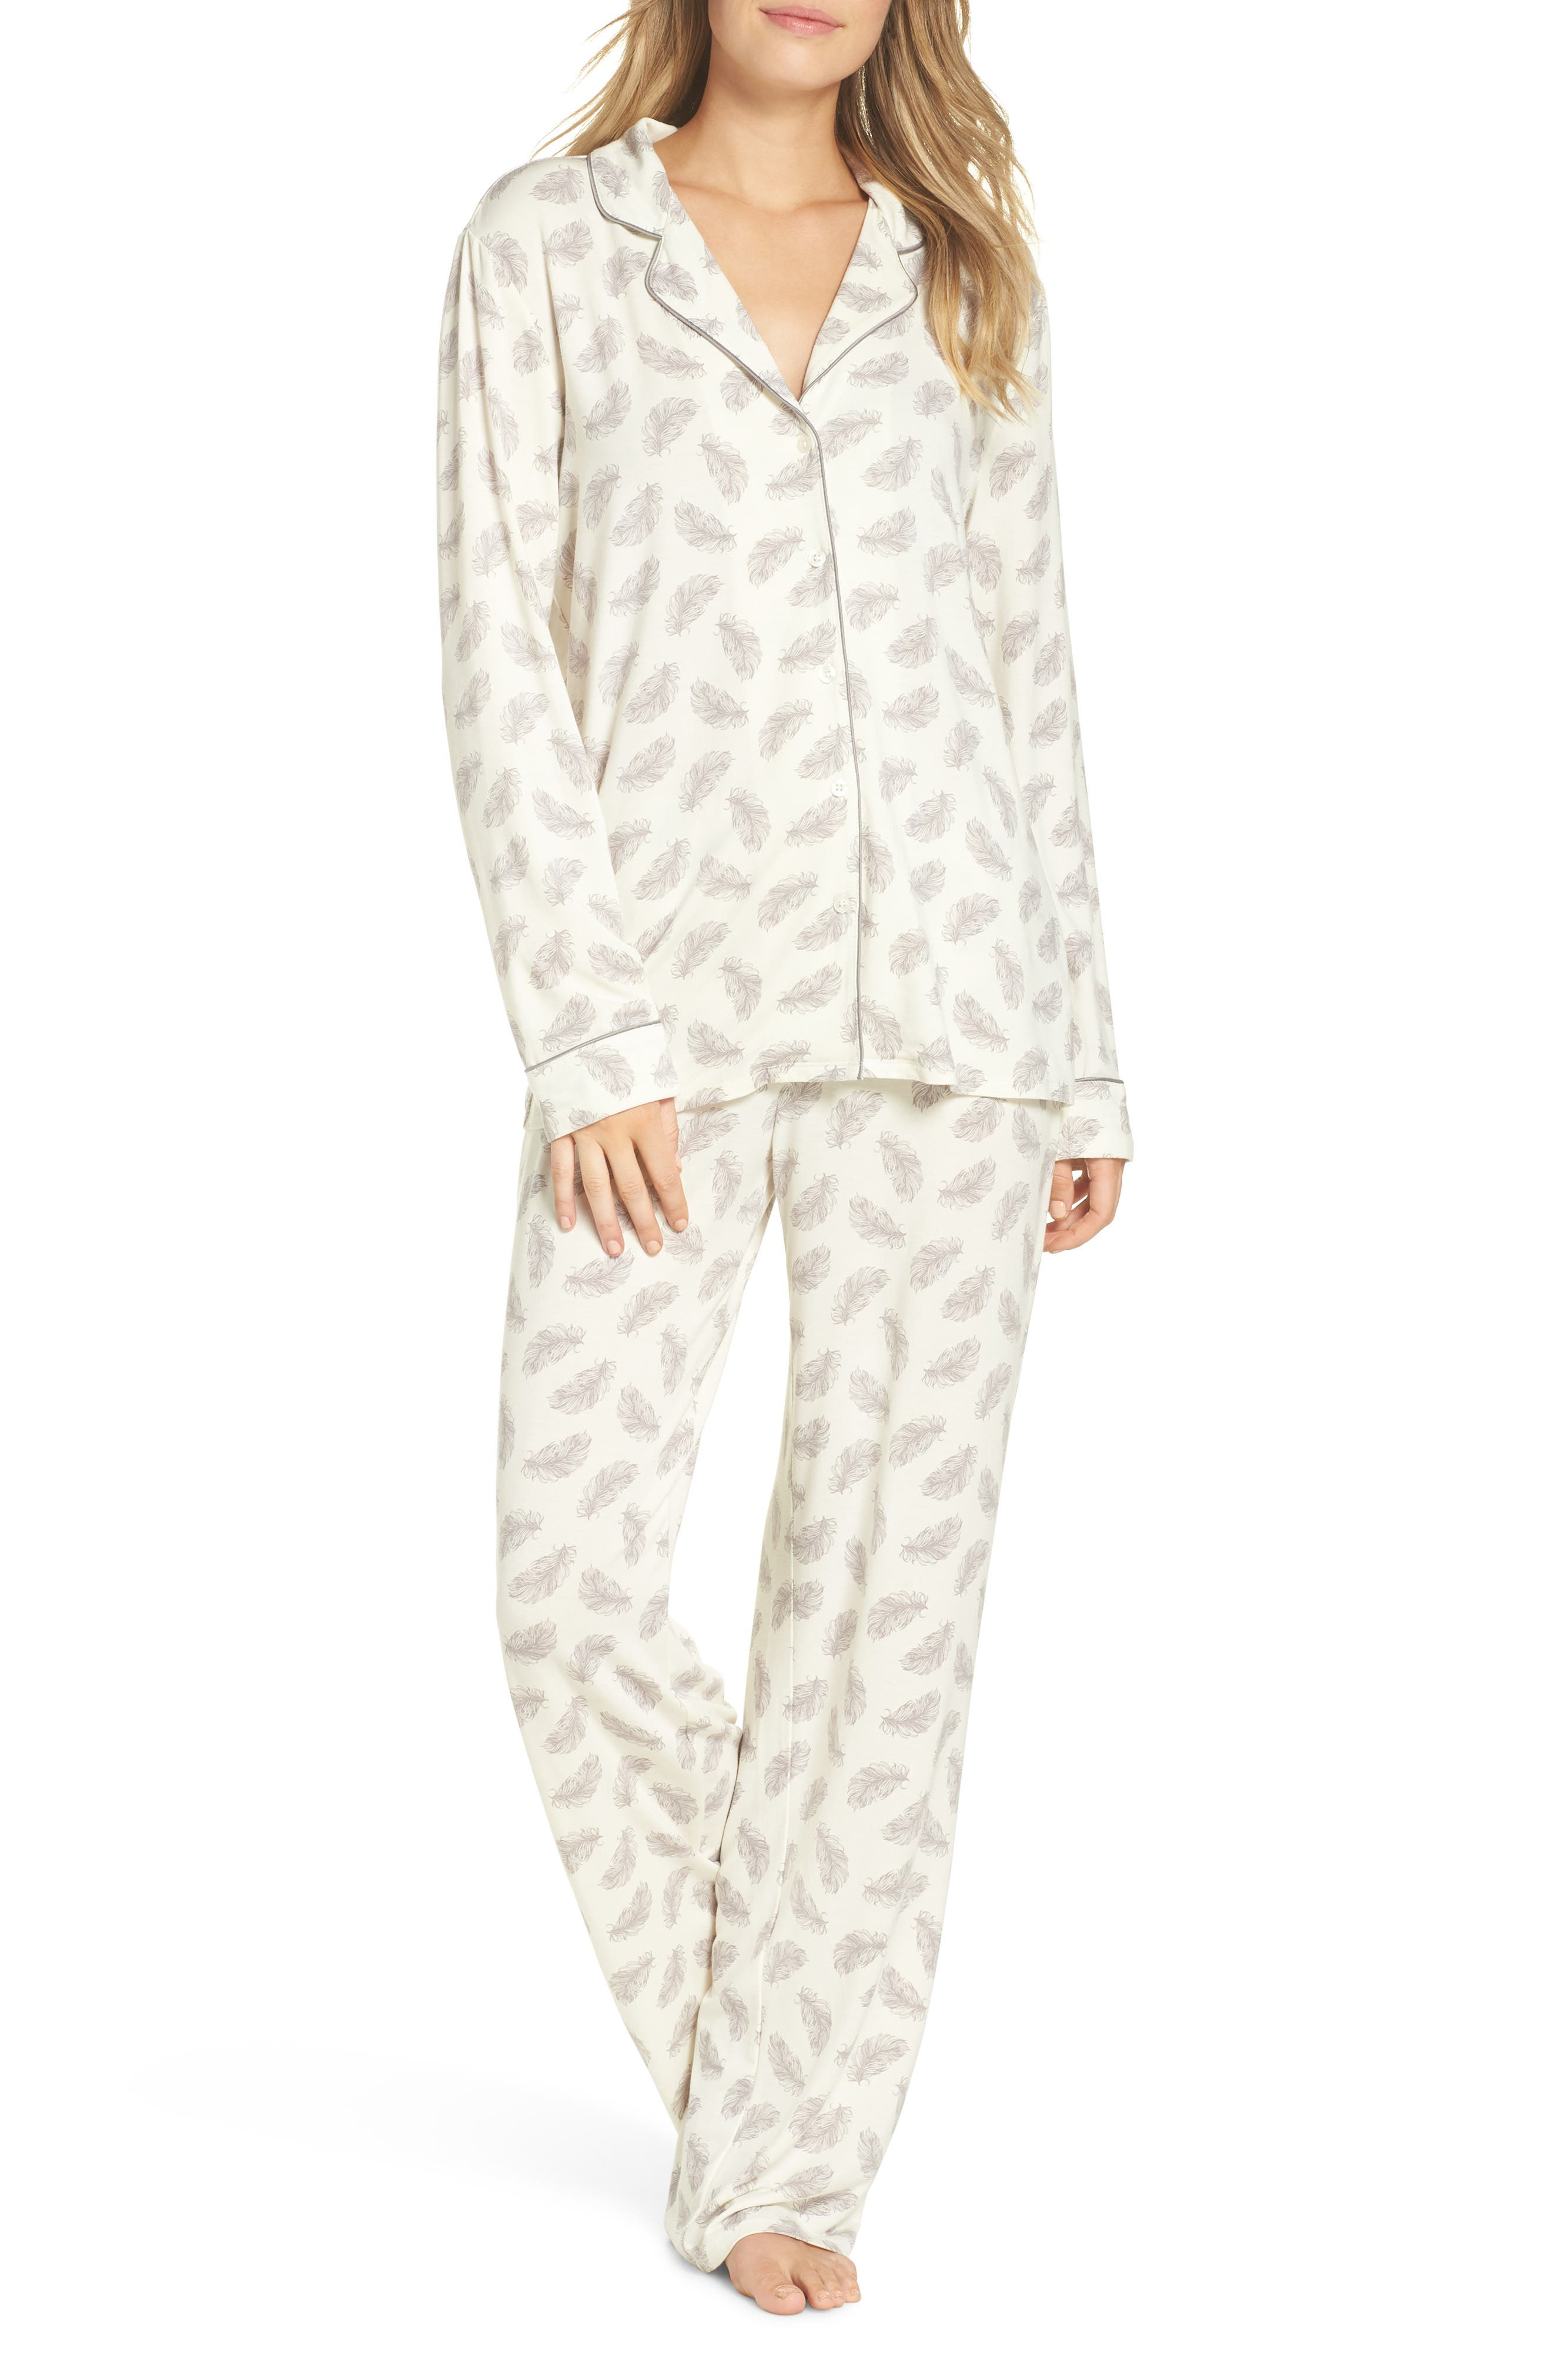 Nordstrom Lingerie Moonlight Pajamas, Ivory